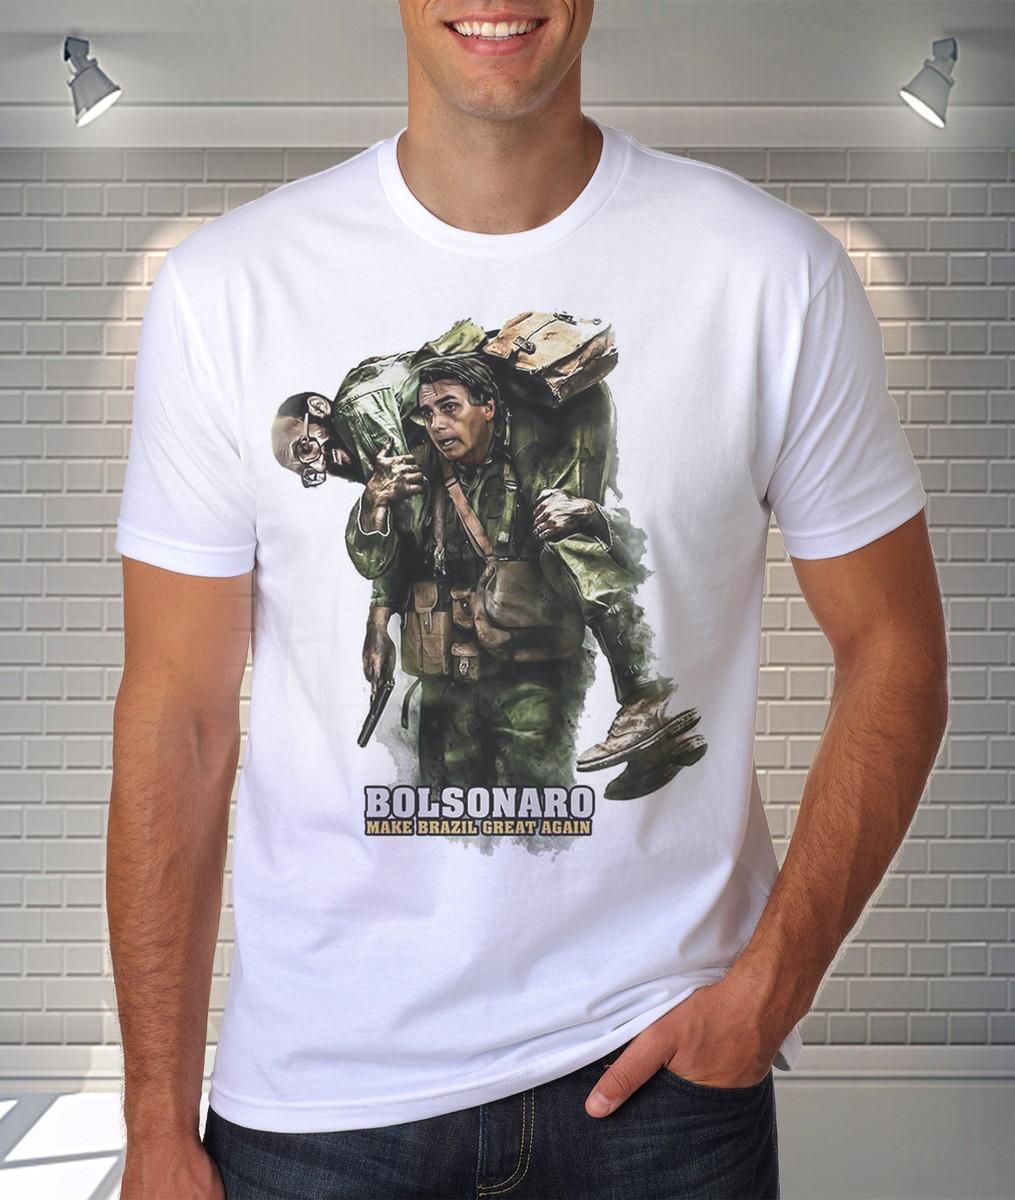 2169f307d90c6 Camisa Camiseta Jair Bolsonaro Presidente Carregando Eneas no Elo7 ...